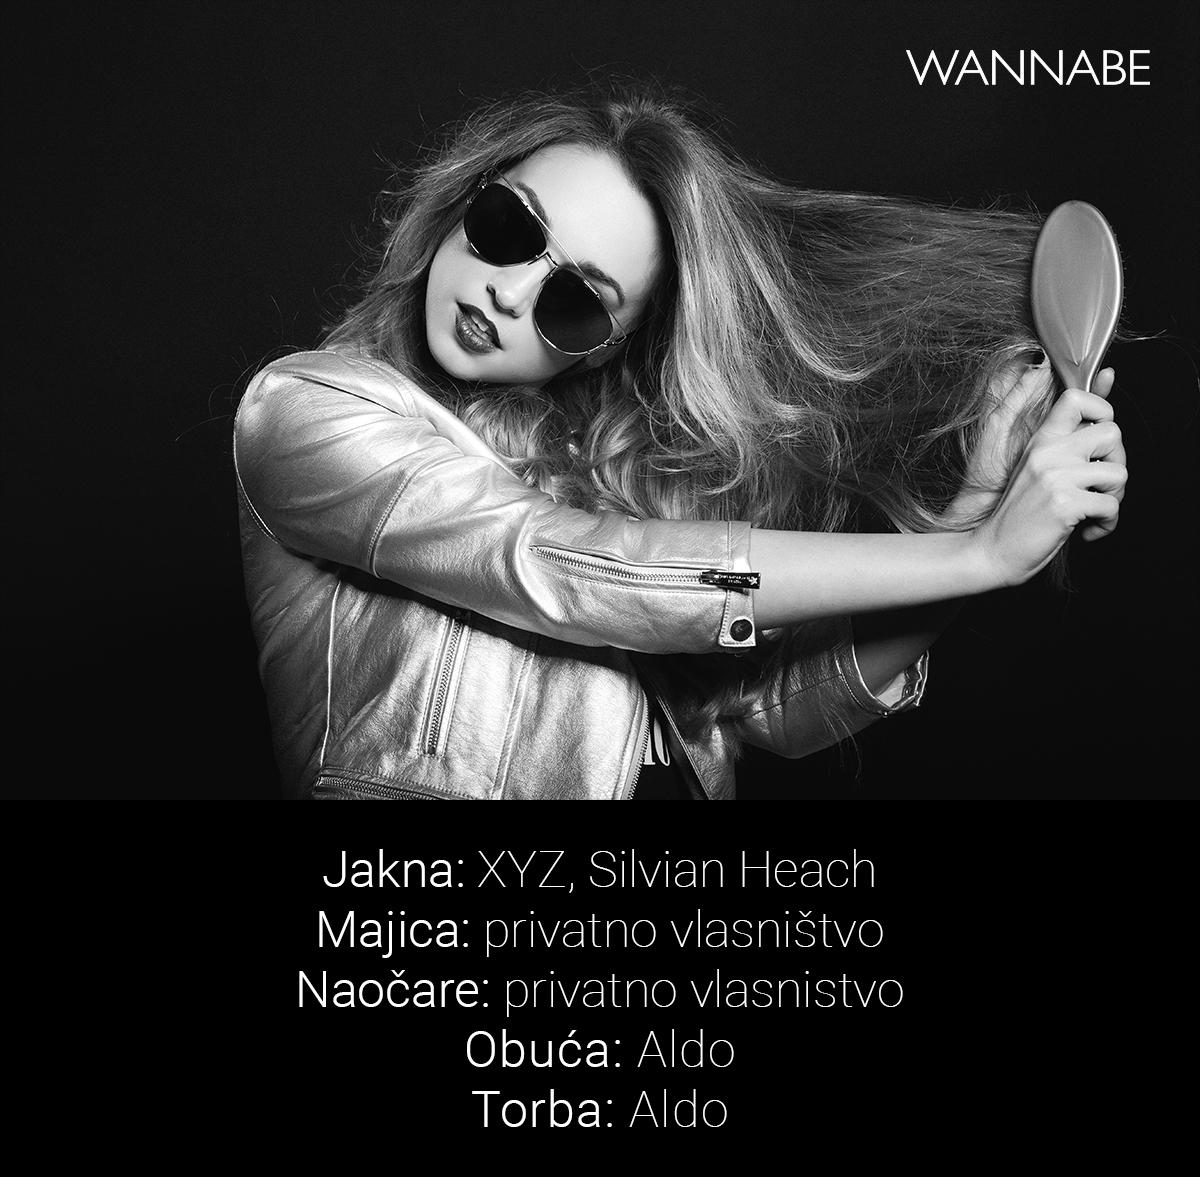 Wannabe Editorijal Mart W1200 10 Wannabe editorijal: BlacknWhite